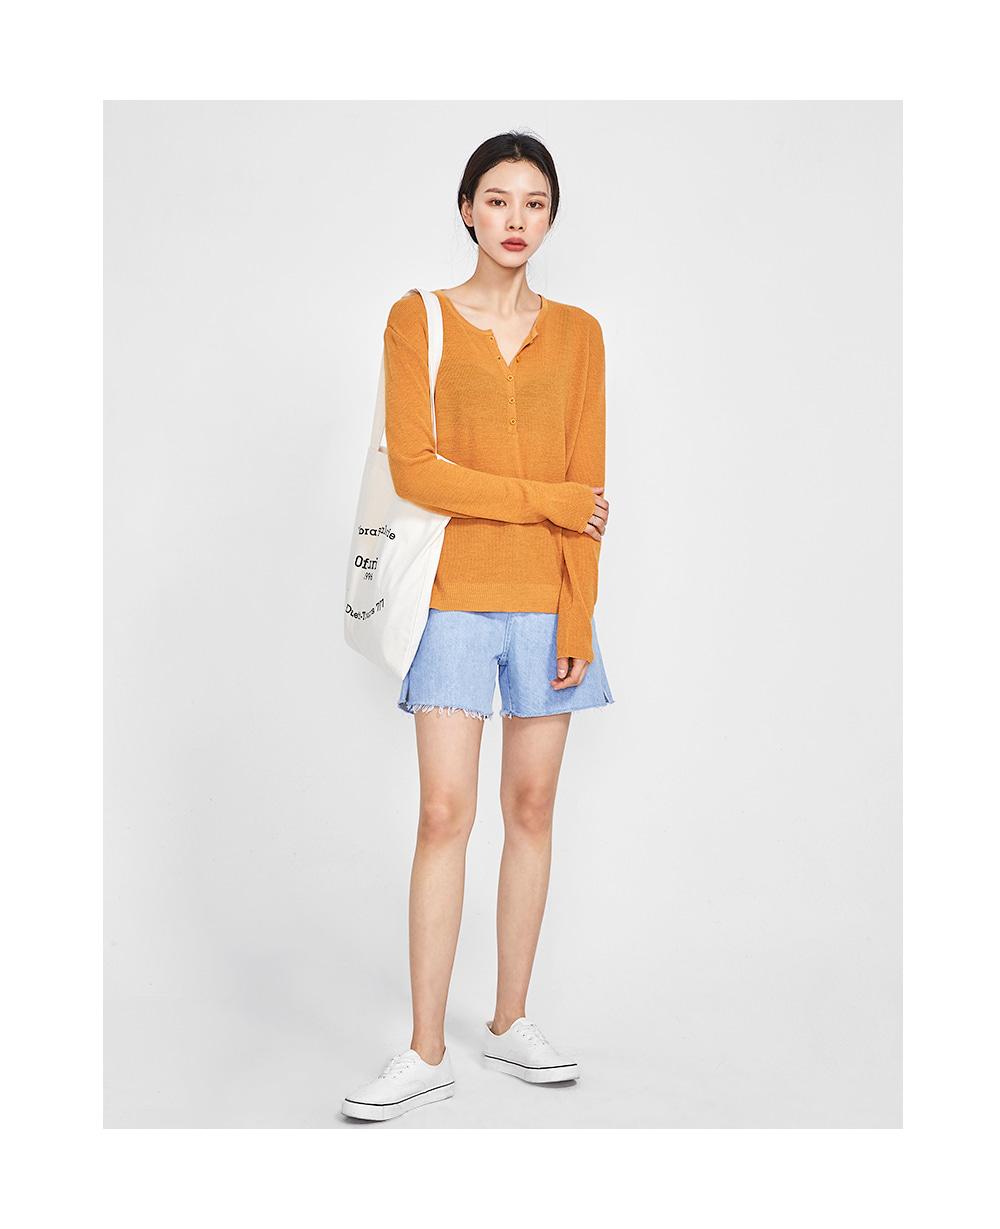 AIN - Korean Fashion - #Kfashion - Paris Lettering Eco Bag